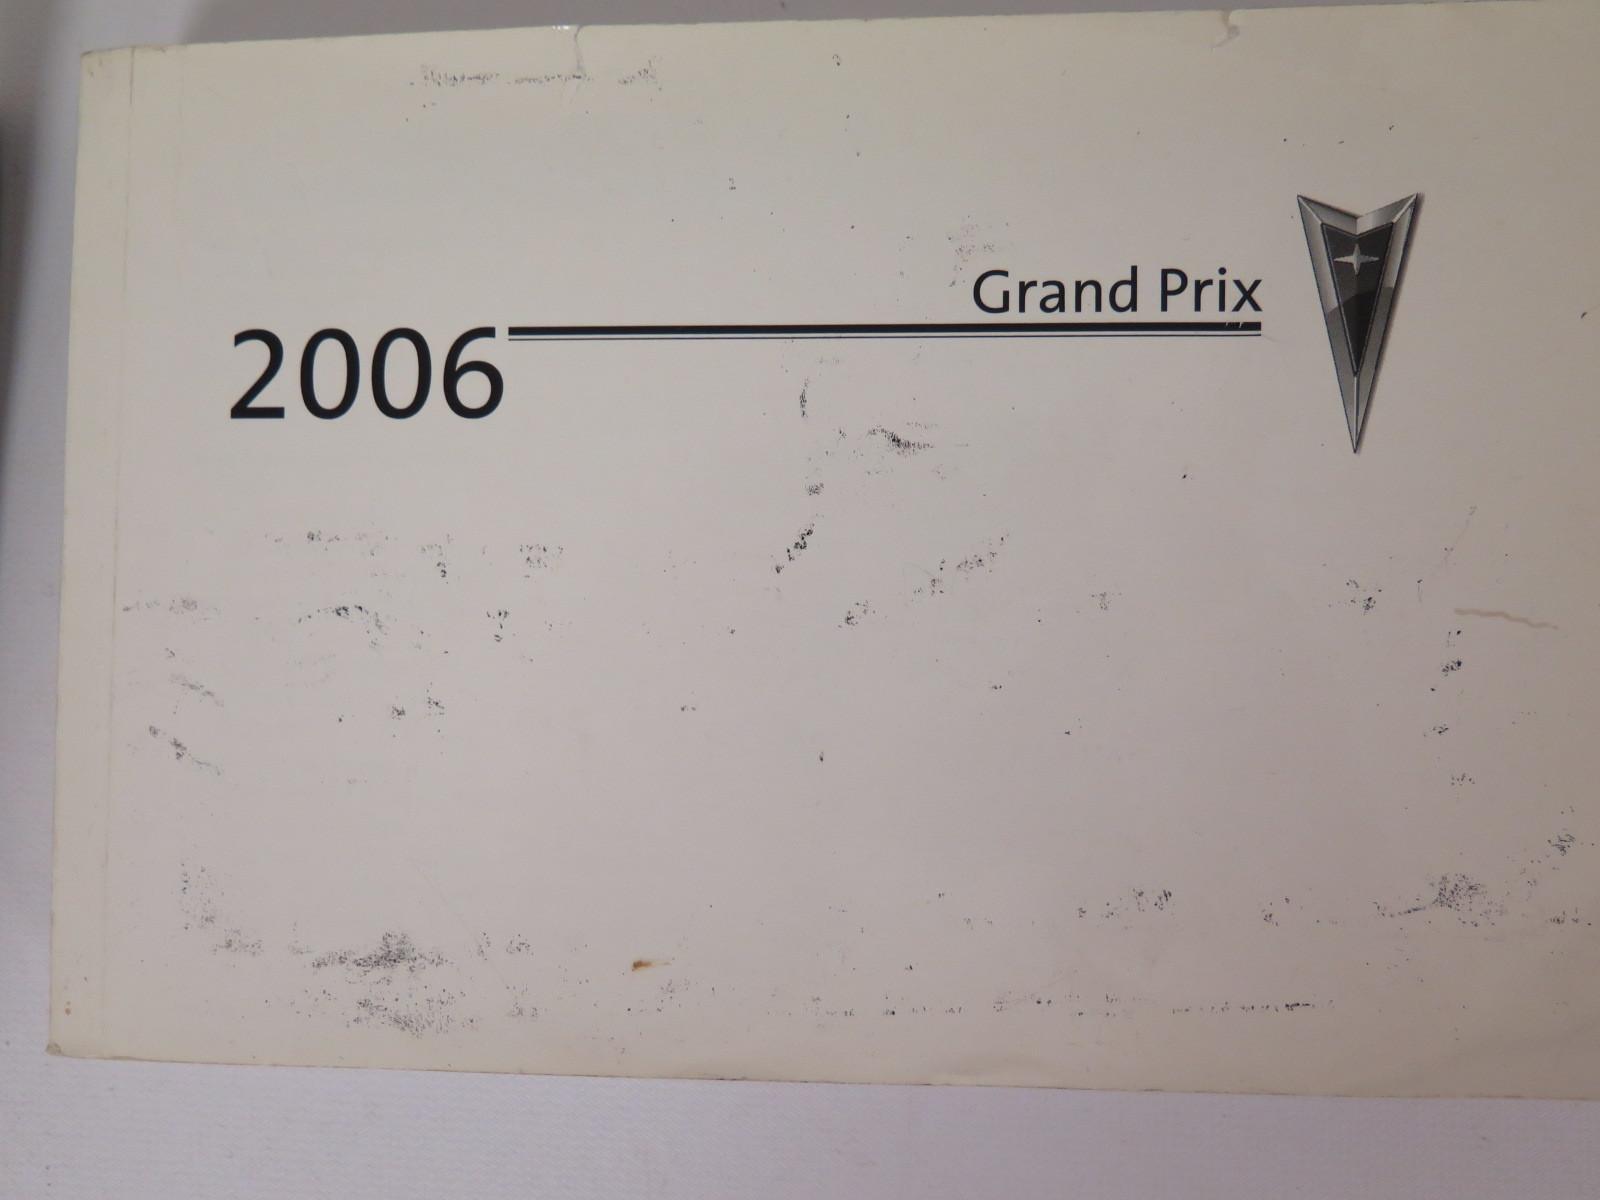 2006 pontiac grand prix owners manual book bashful yak rh bashfulyak com 2006 Pontiac Grand Prix Interior 2006 Pontiac Grand Prix Problems